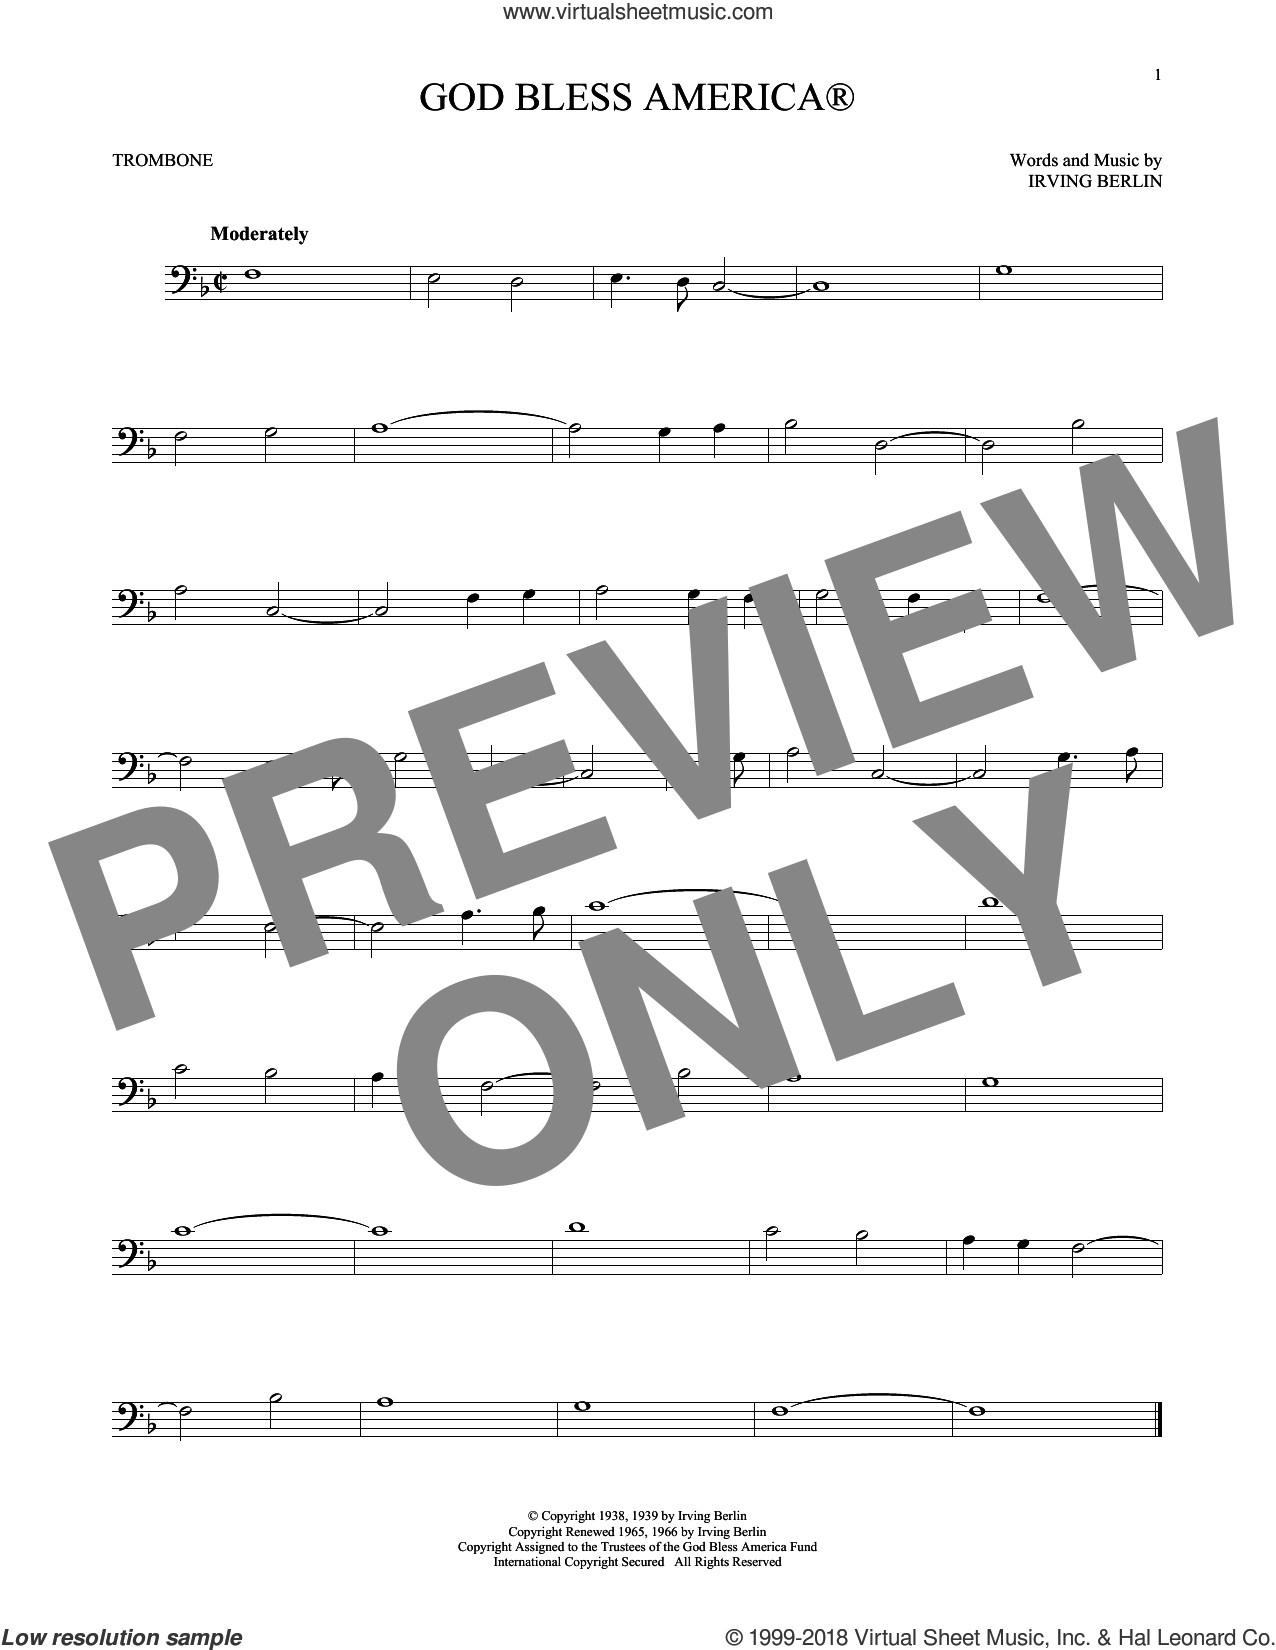 God Bless AmericaA sheet music for trombone solo by Irving Berlin, intermediate skill level